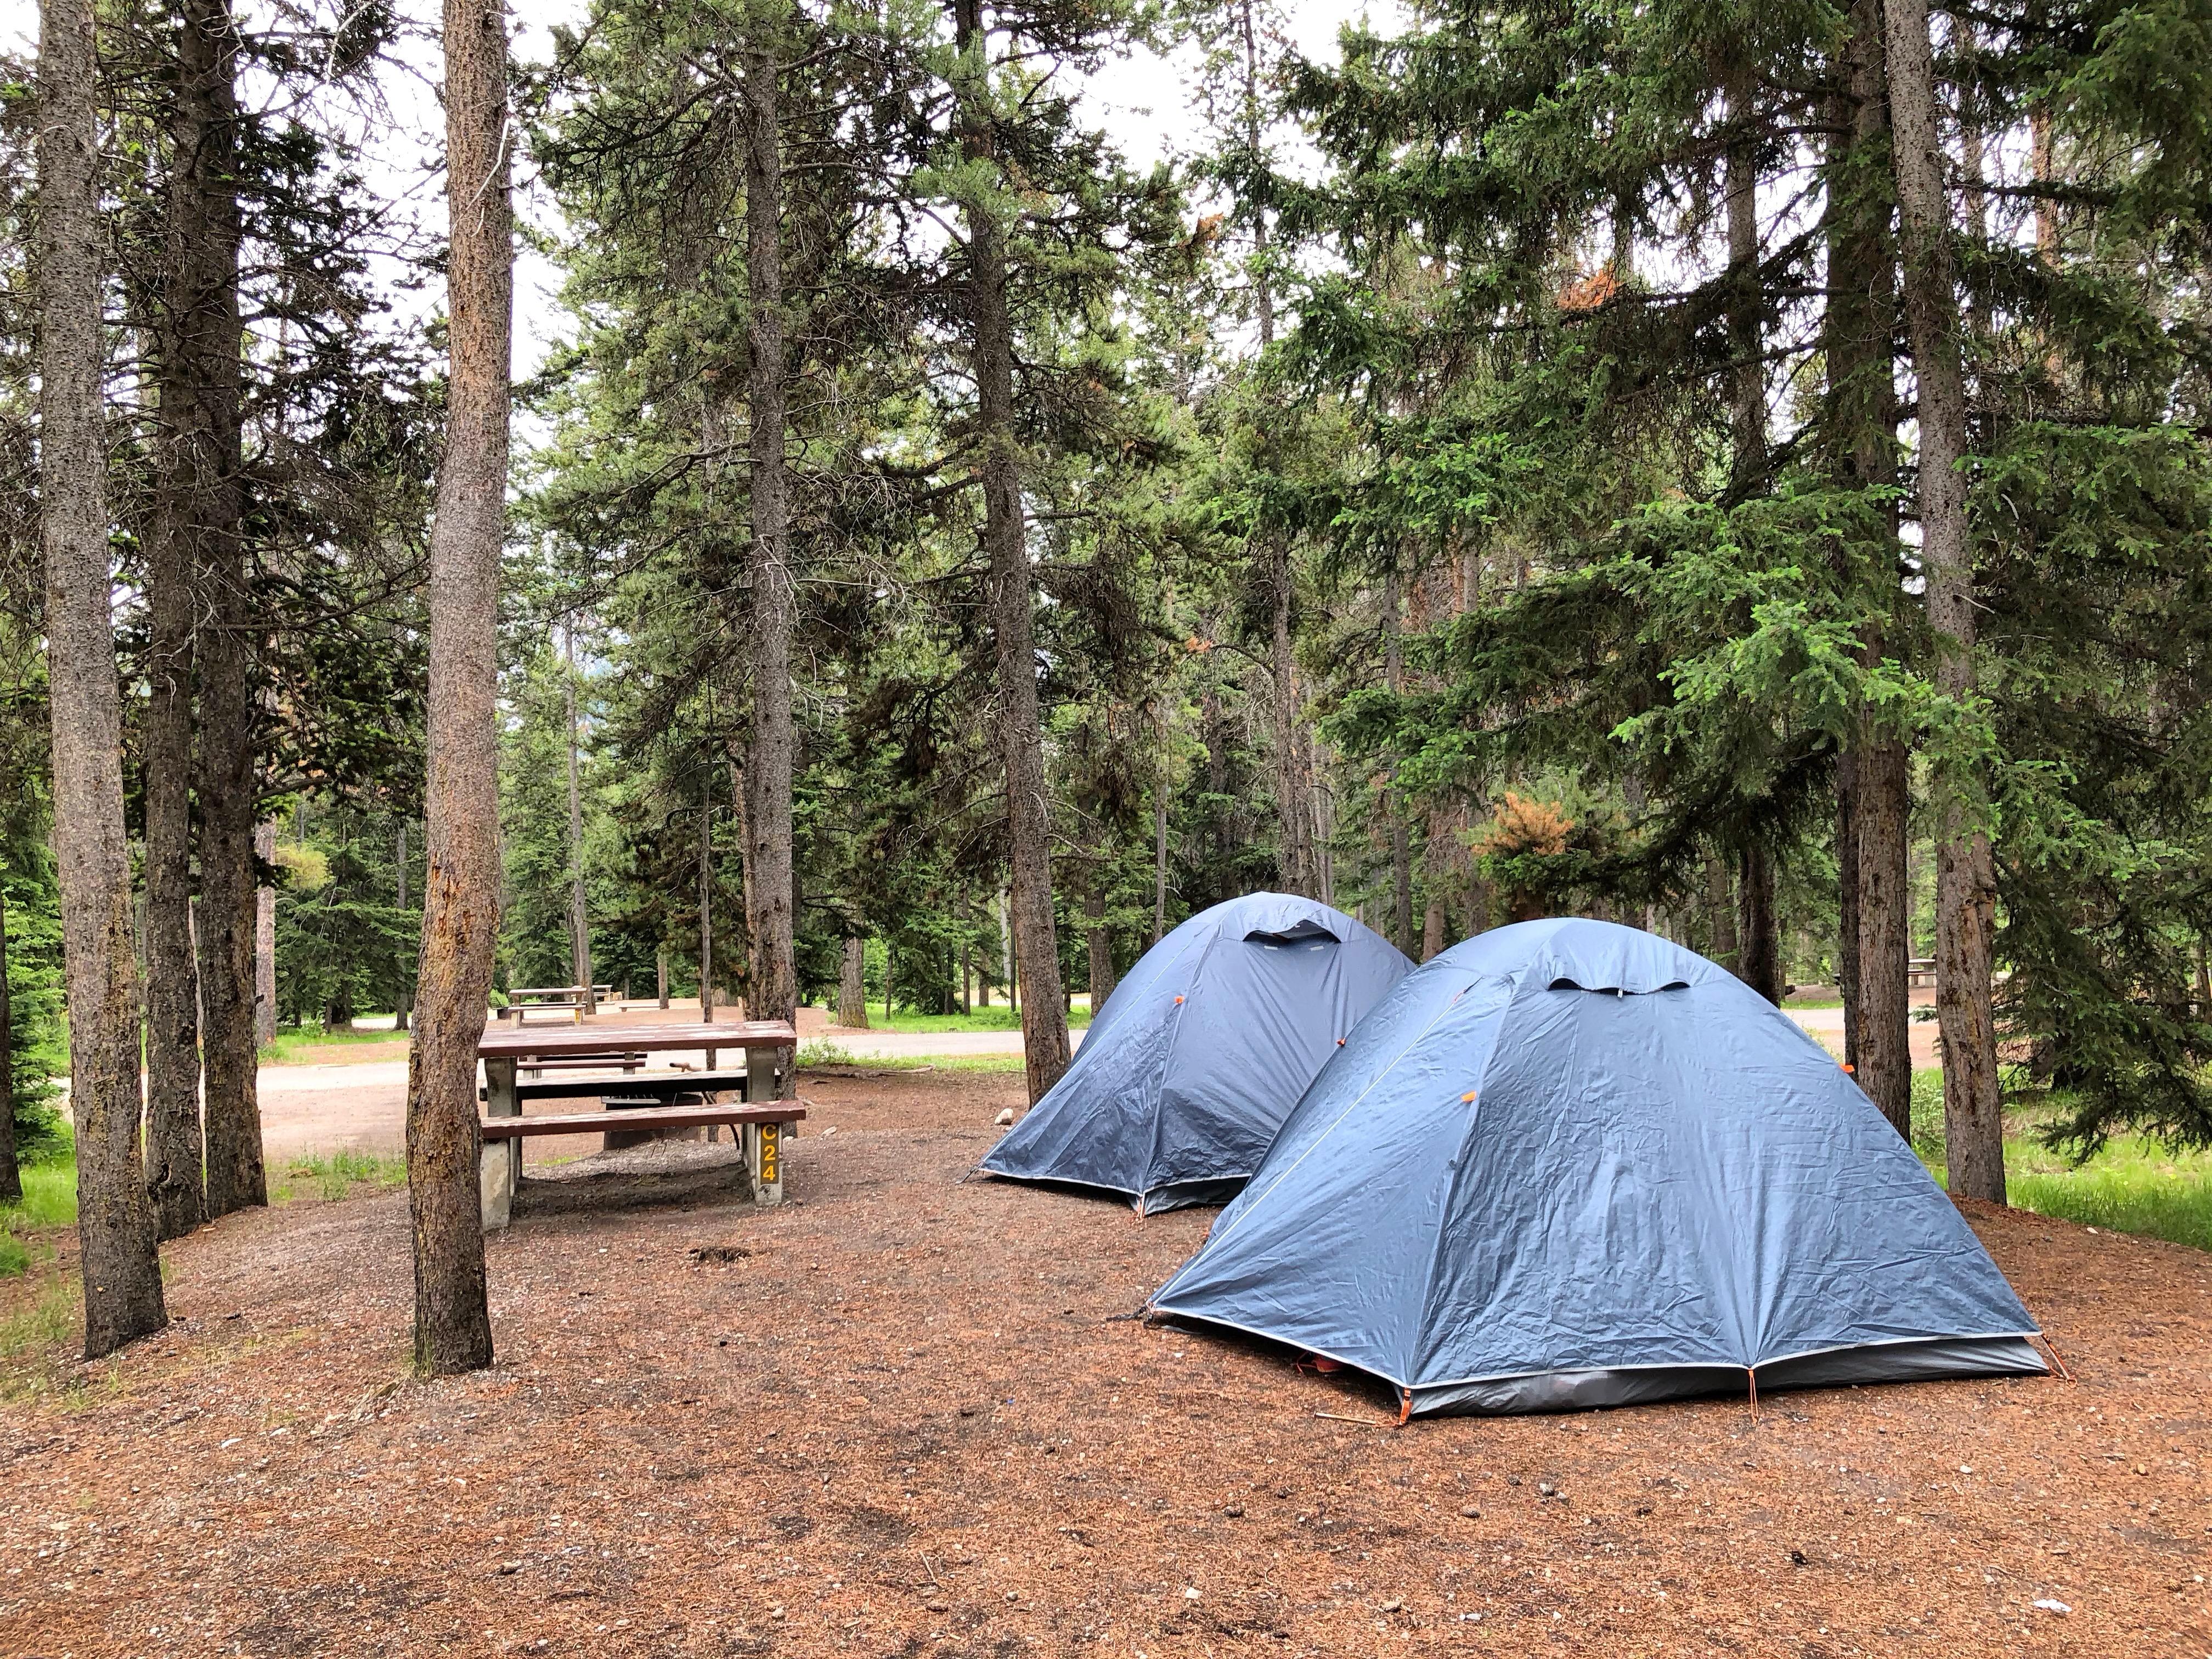 Canada Rockies TrekAmerica Itrekhere 2018 7